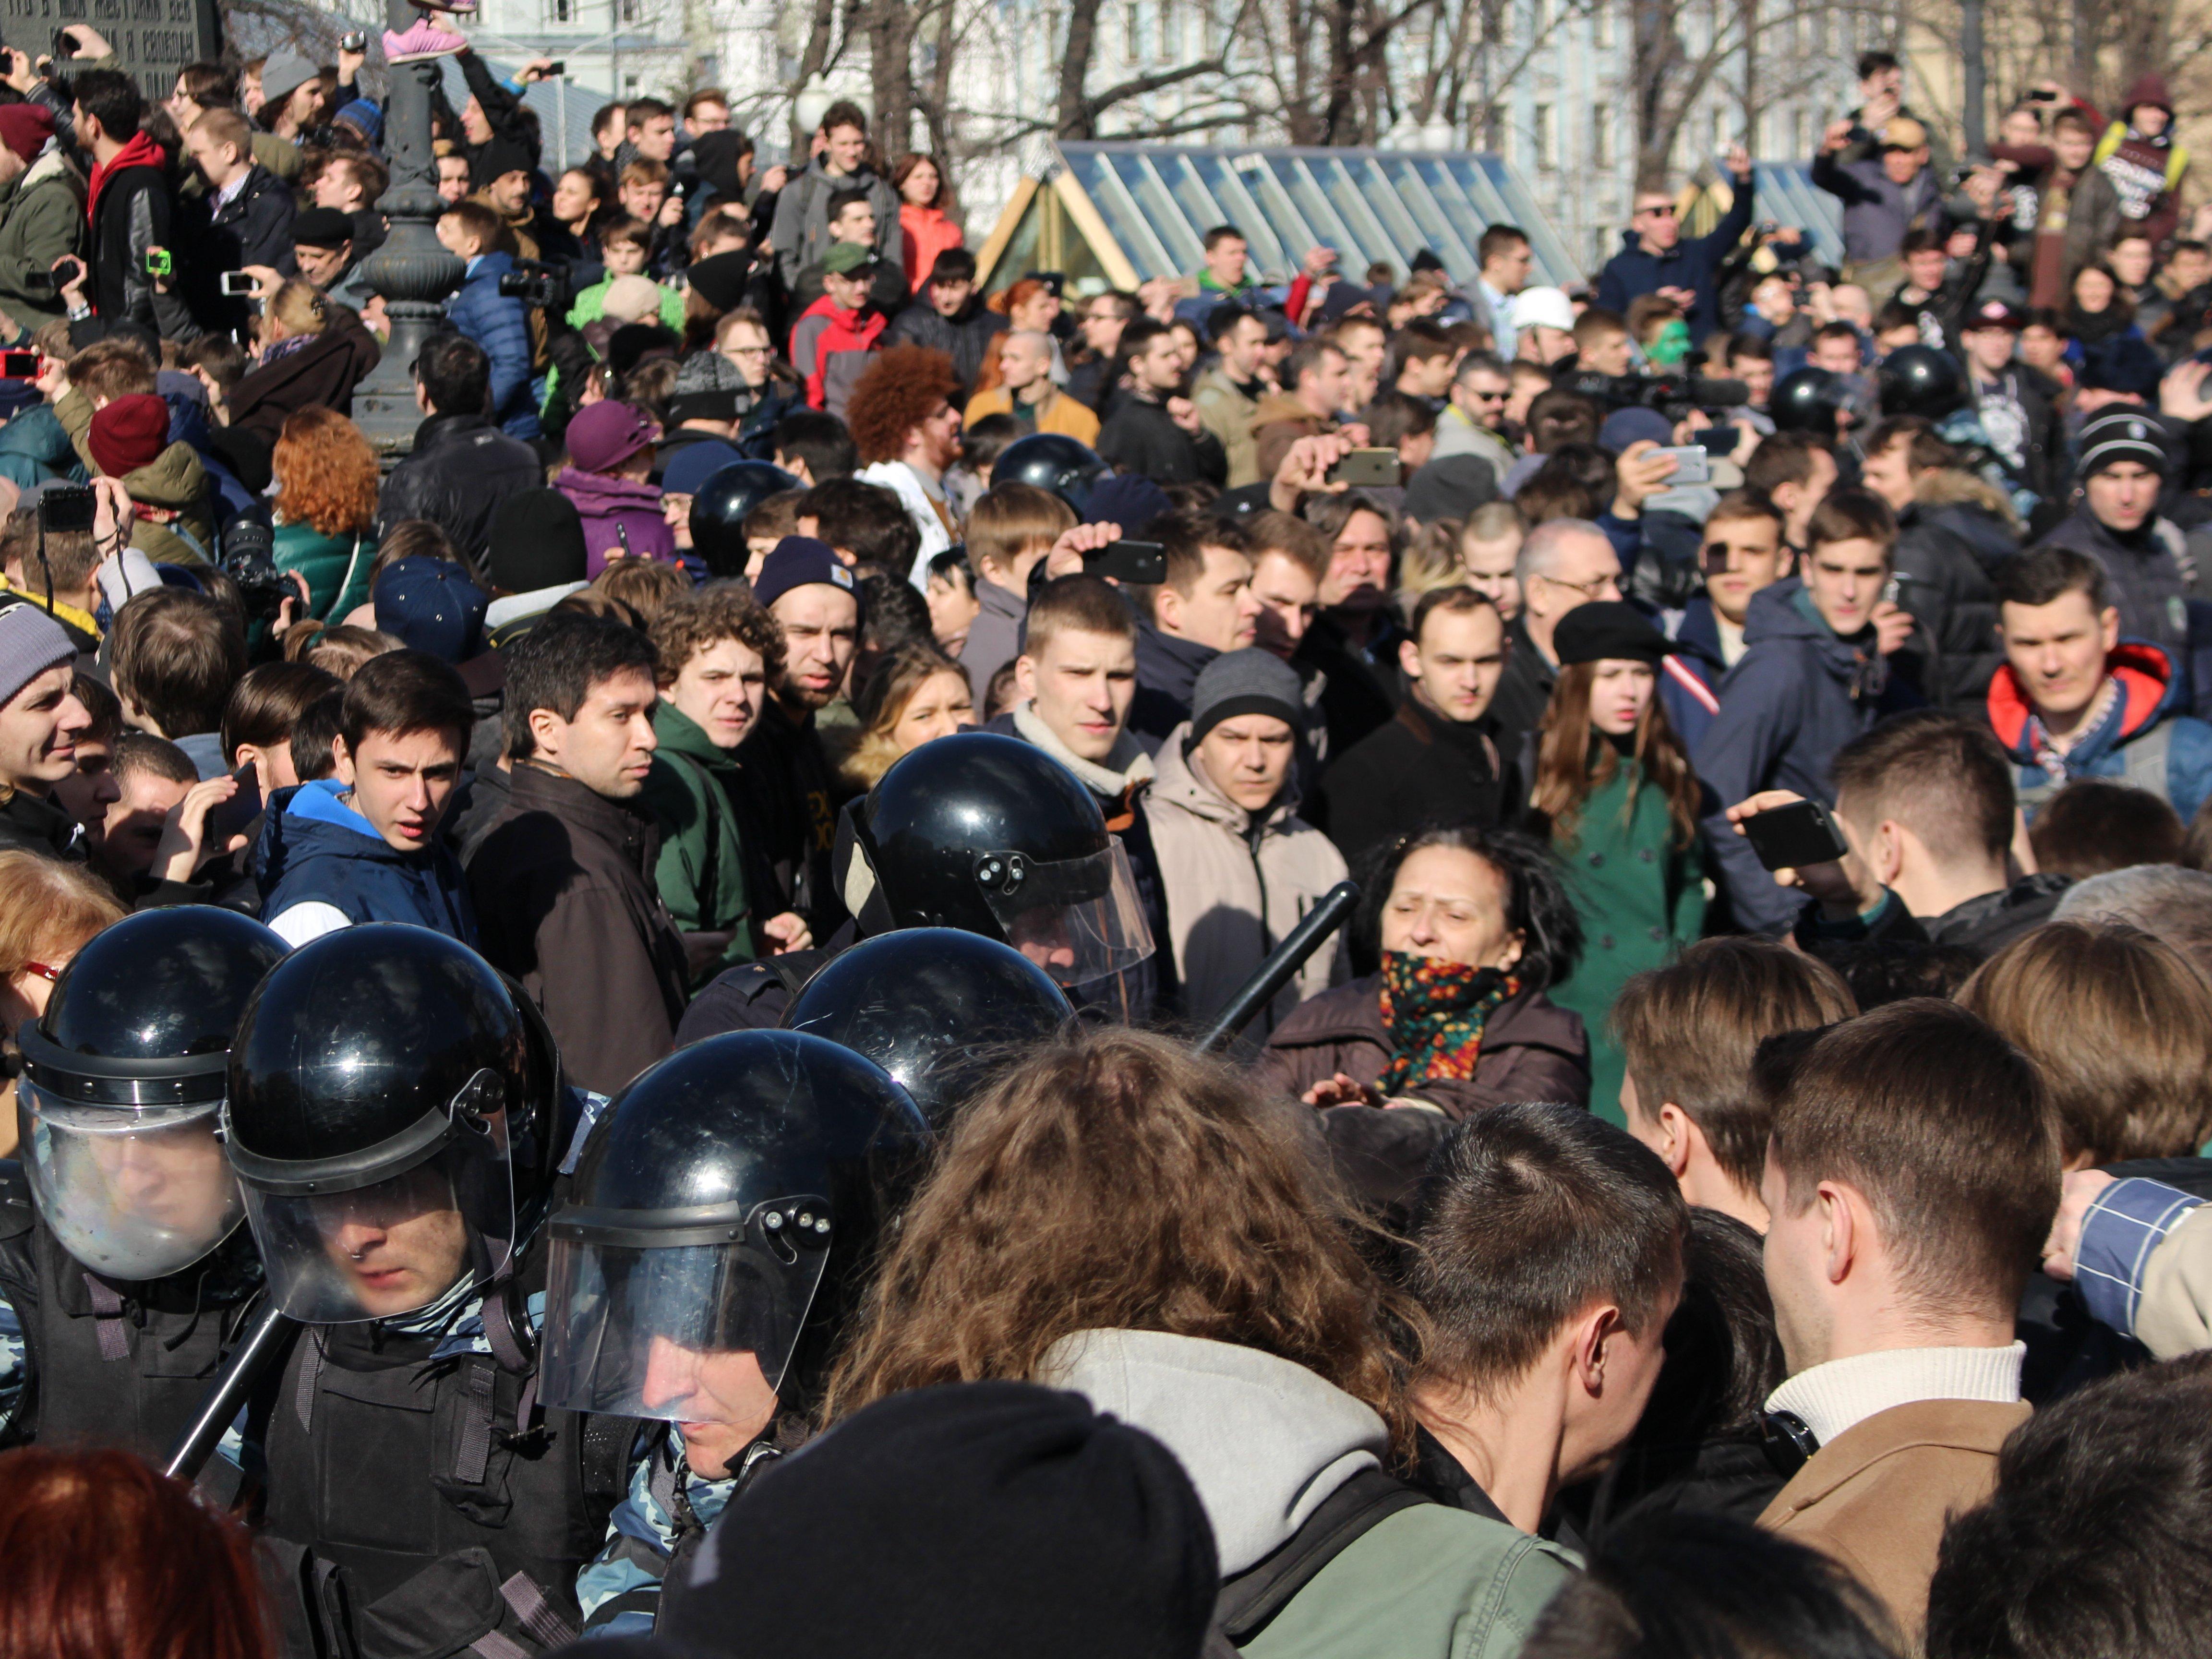 ВВолгограде научастника митинга против коррупции заведено уголовное дело